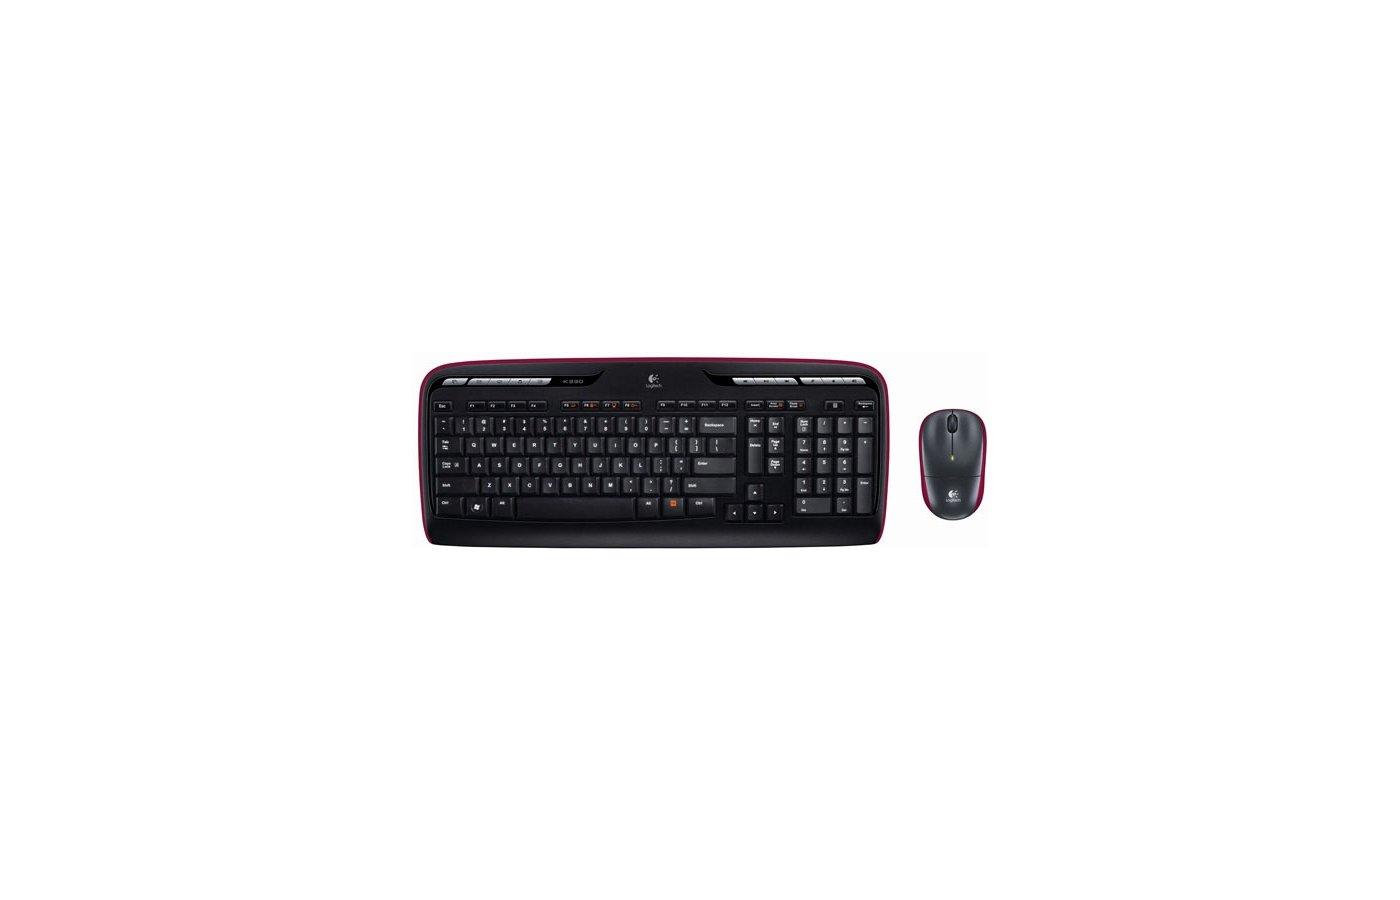 Клавиатура + мышь Logitech Wireless Combo MK330 (920-003995) беспроводной